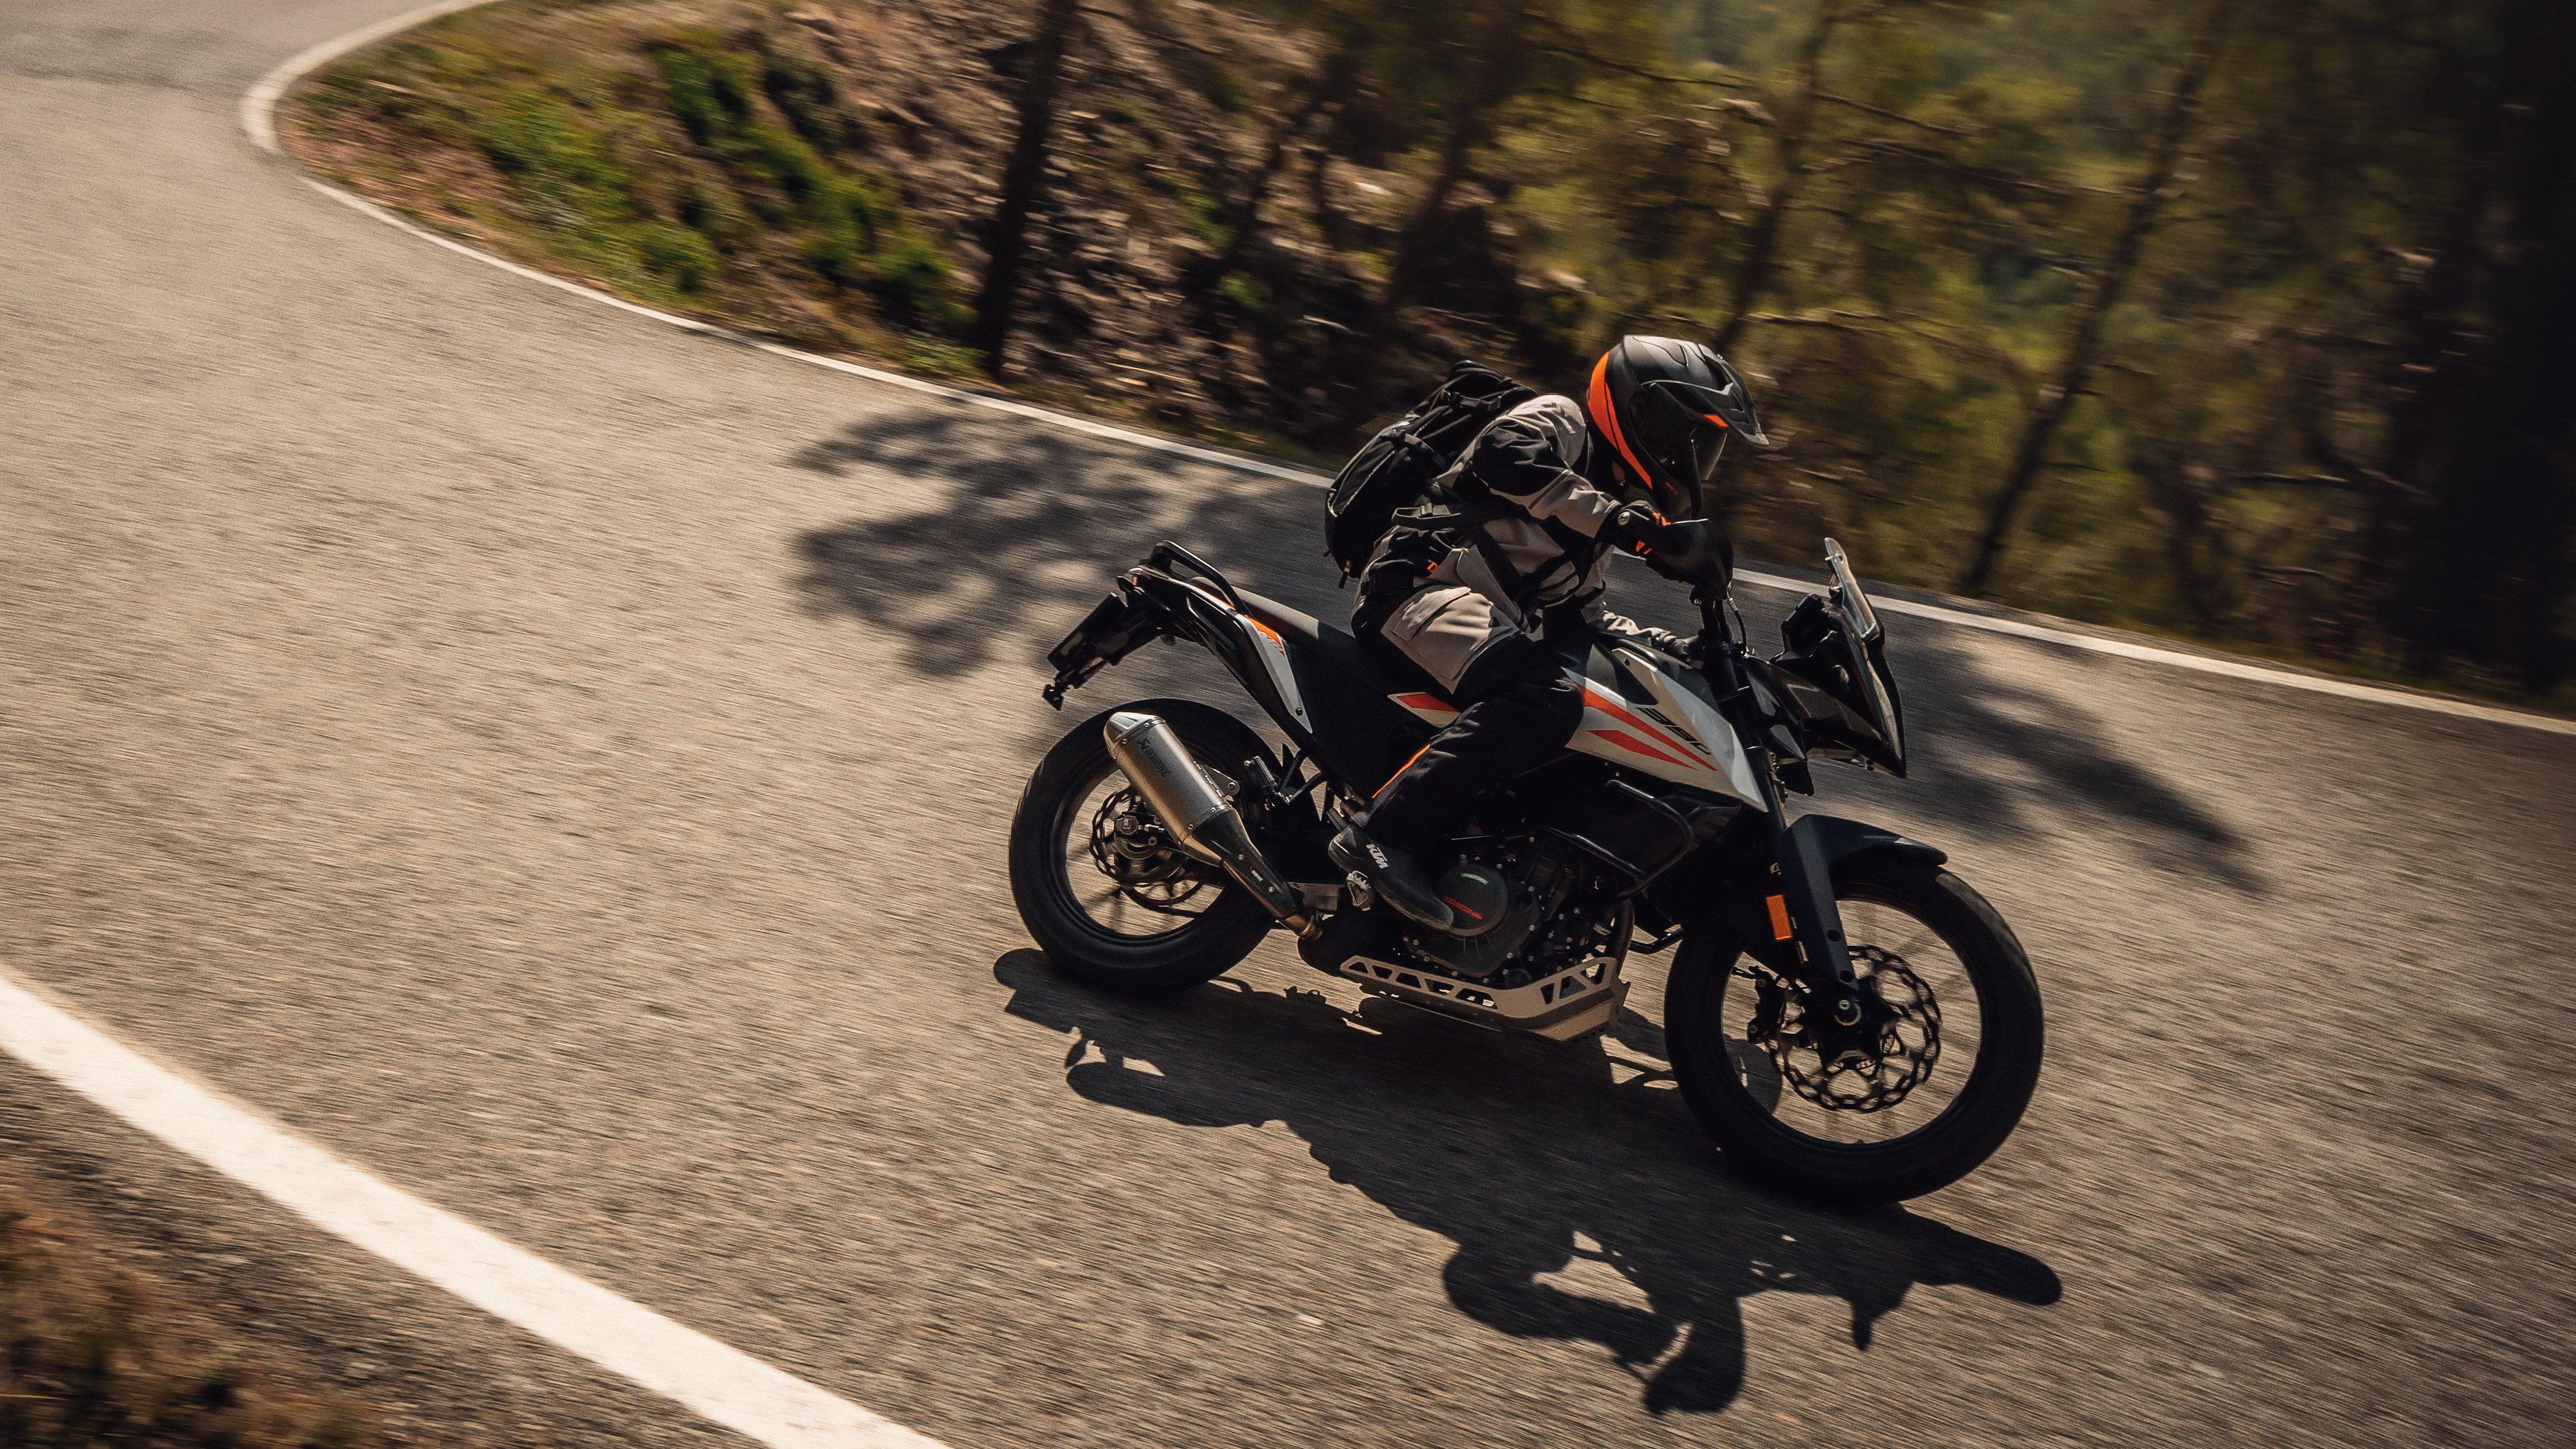 2020 Ktm 390 Adventure With Images Ktm Adventure